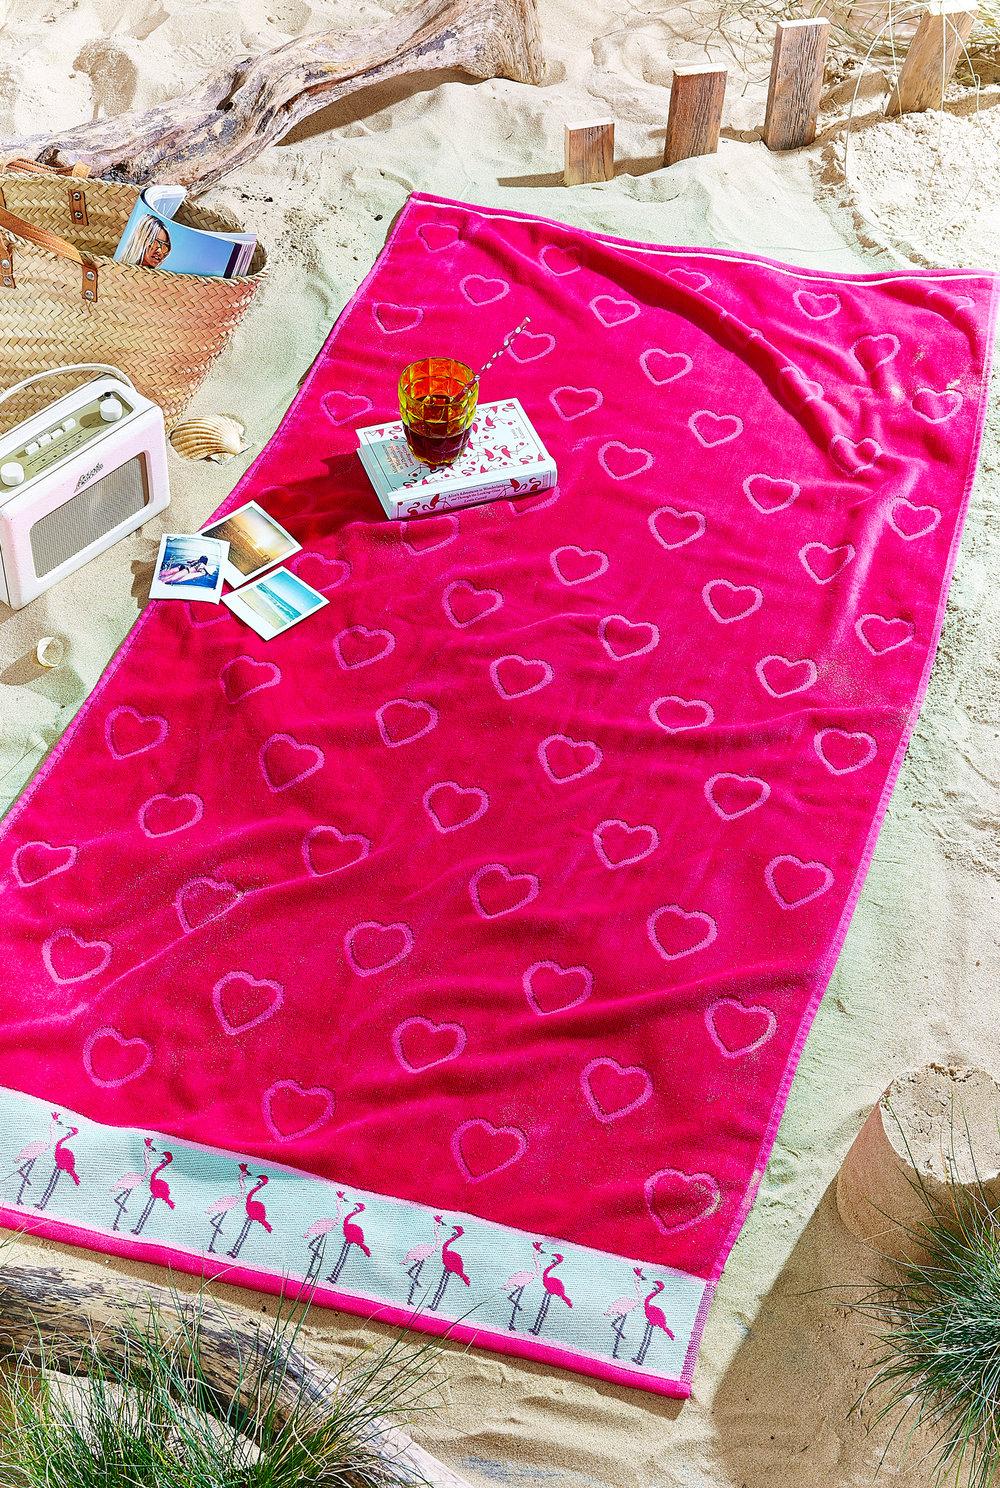 38165_Flamingo-Beach-Towel-Singular-Shot_Pink.jpg